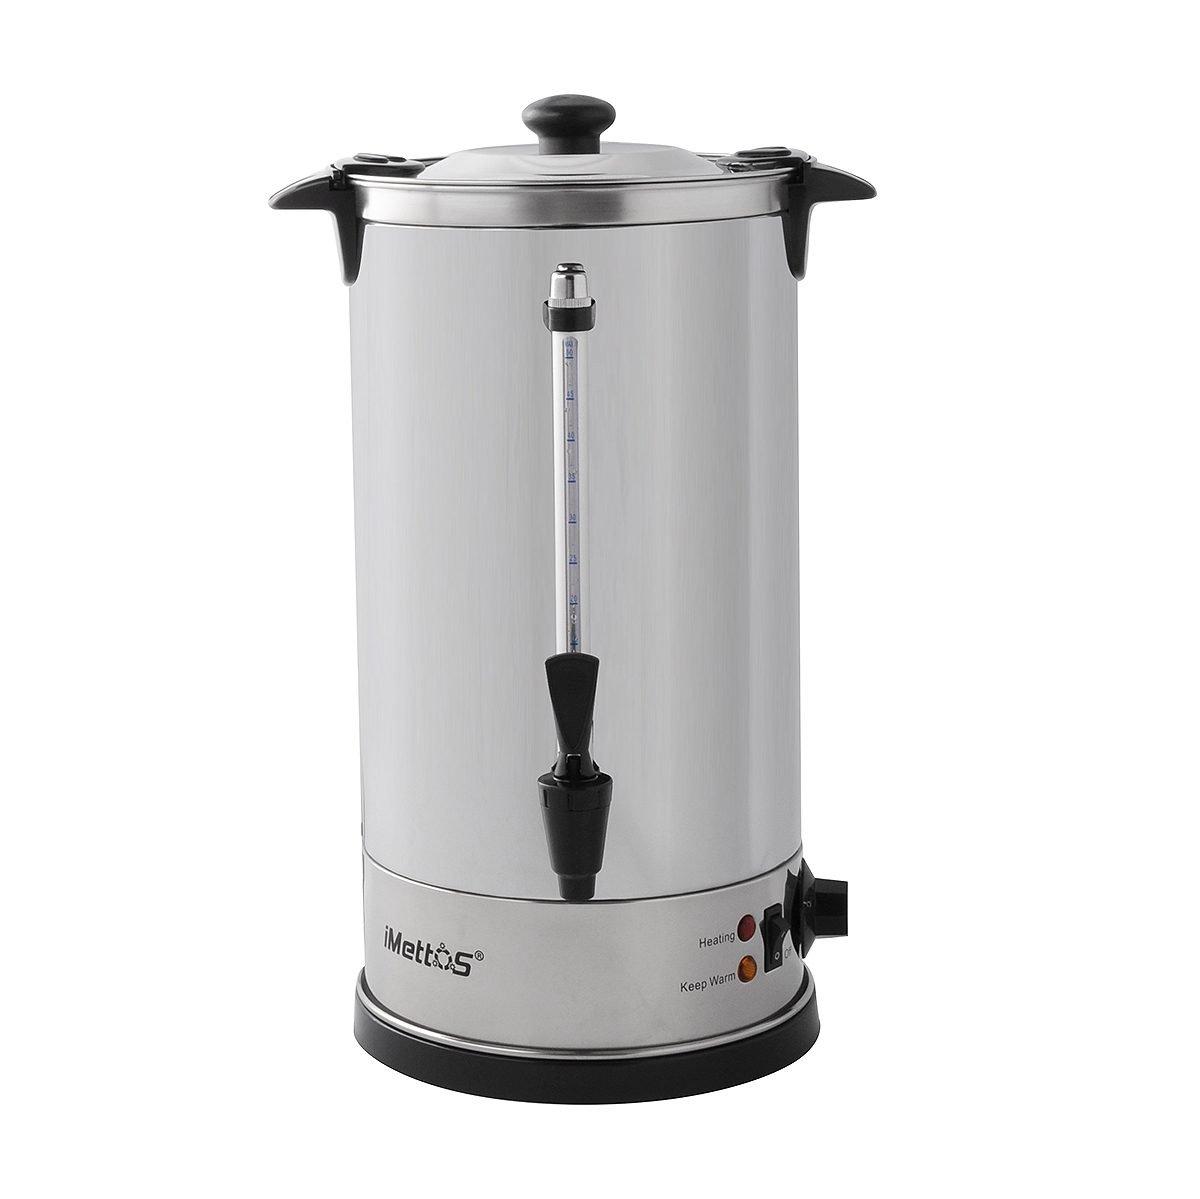 New Imettos 501002 10 Ltr Water Boiler For Sale